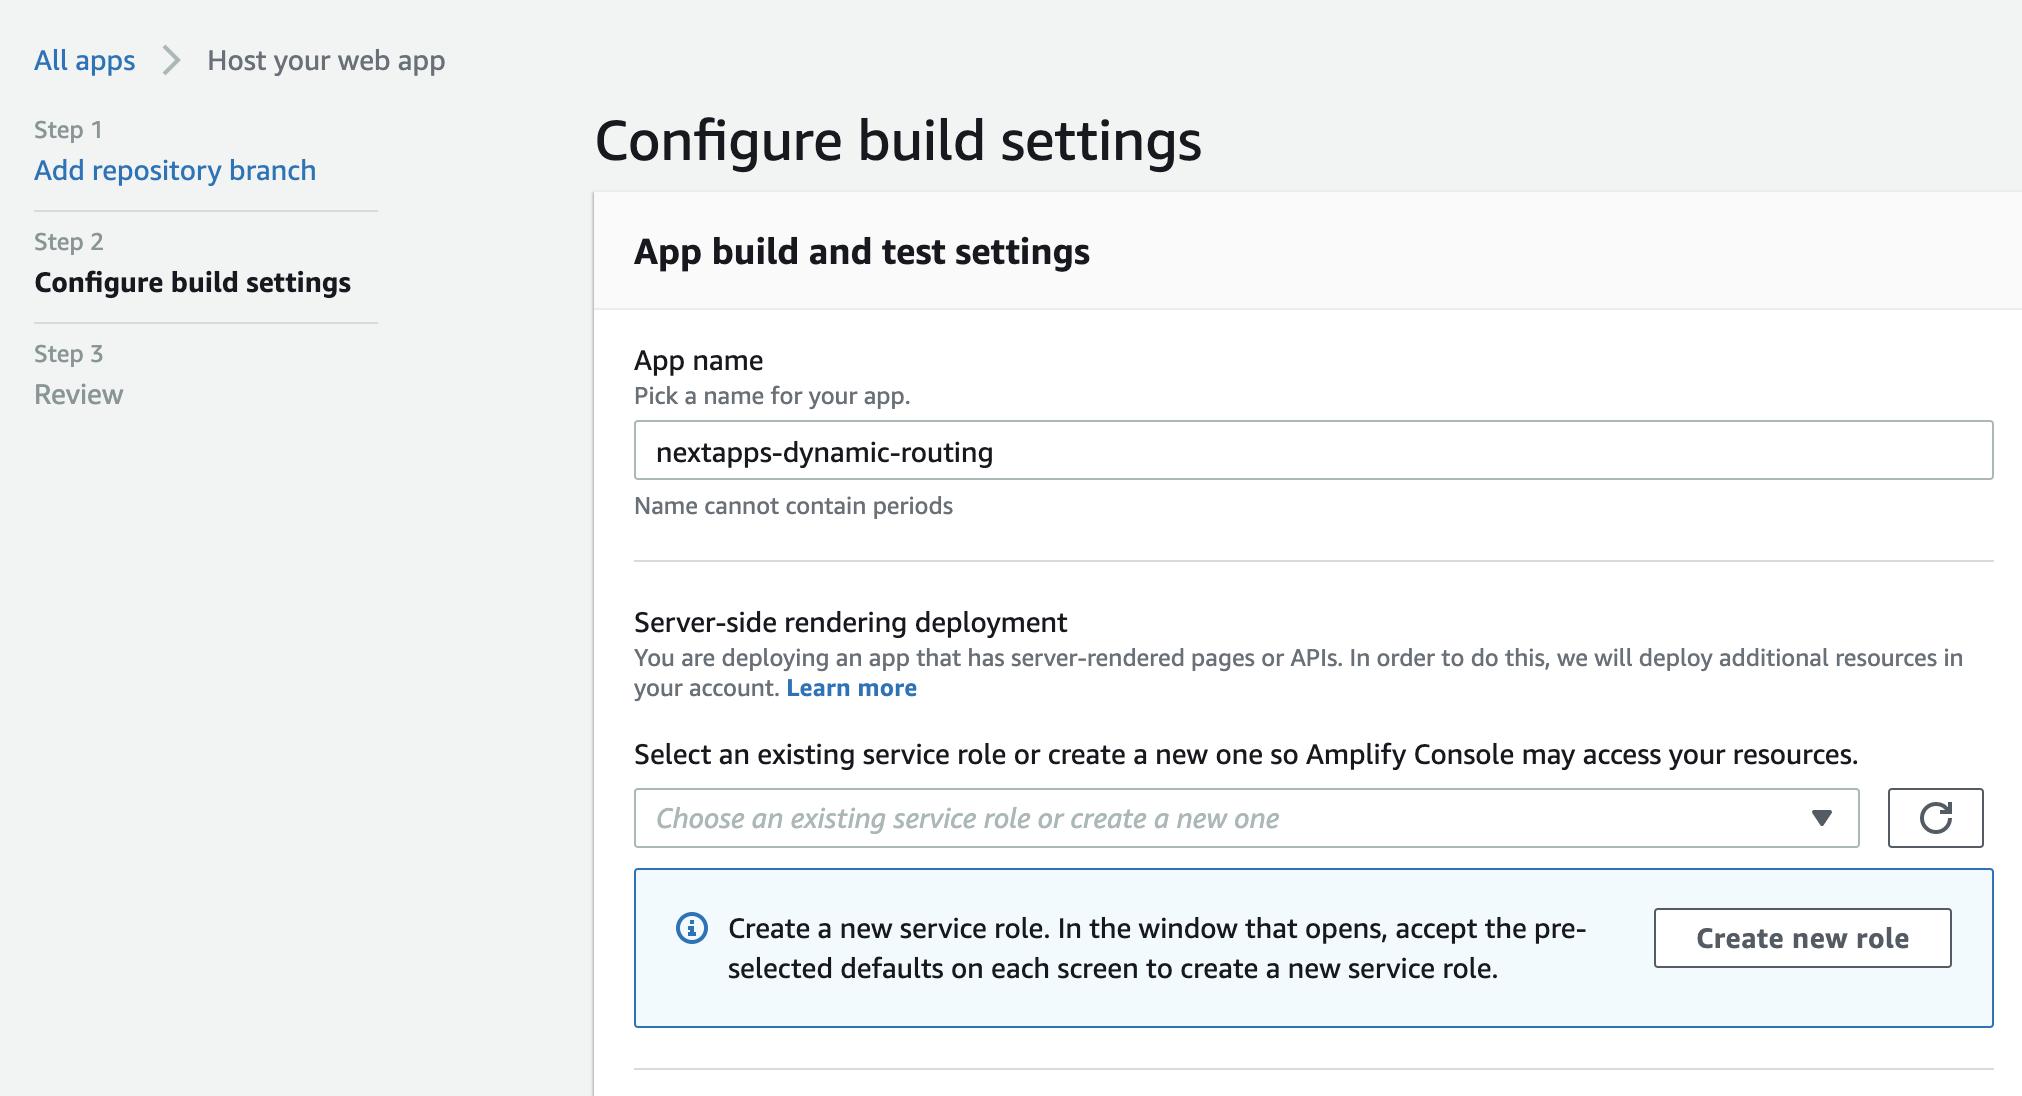 AWS Amplify host your web app, configure build settings